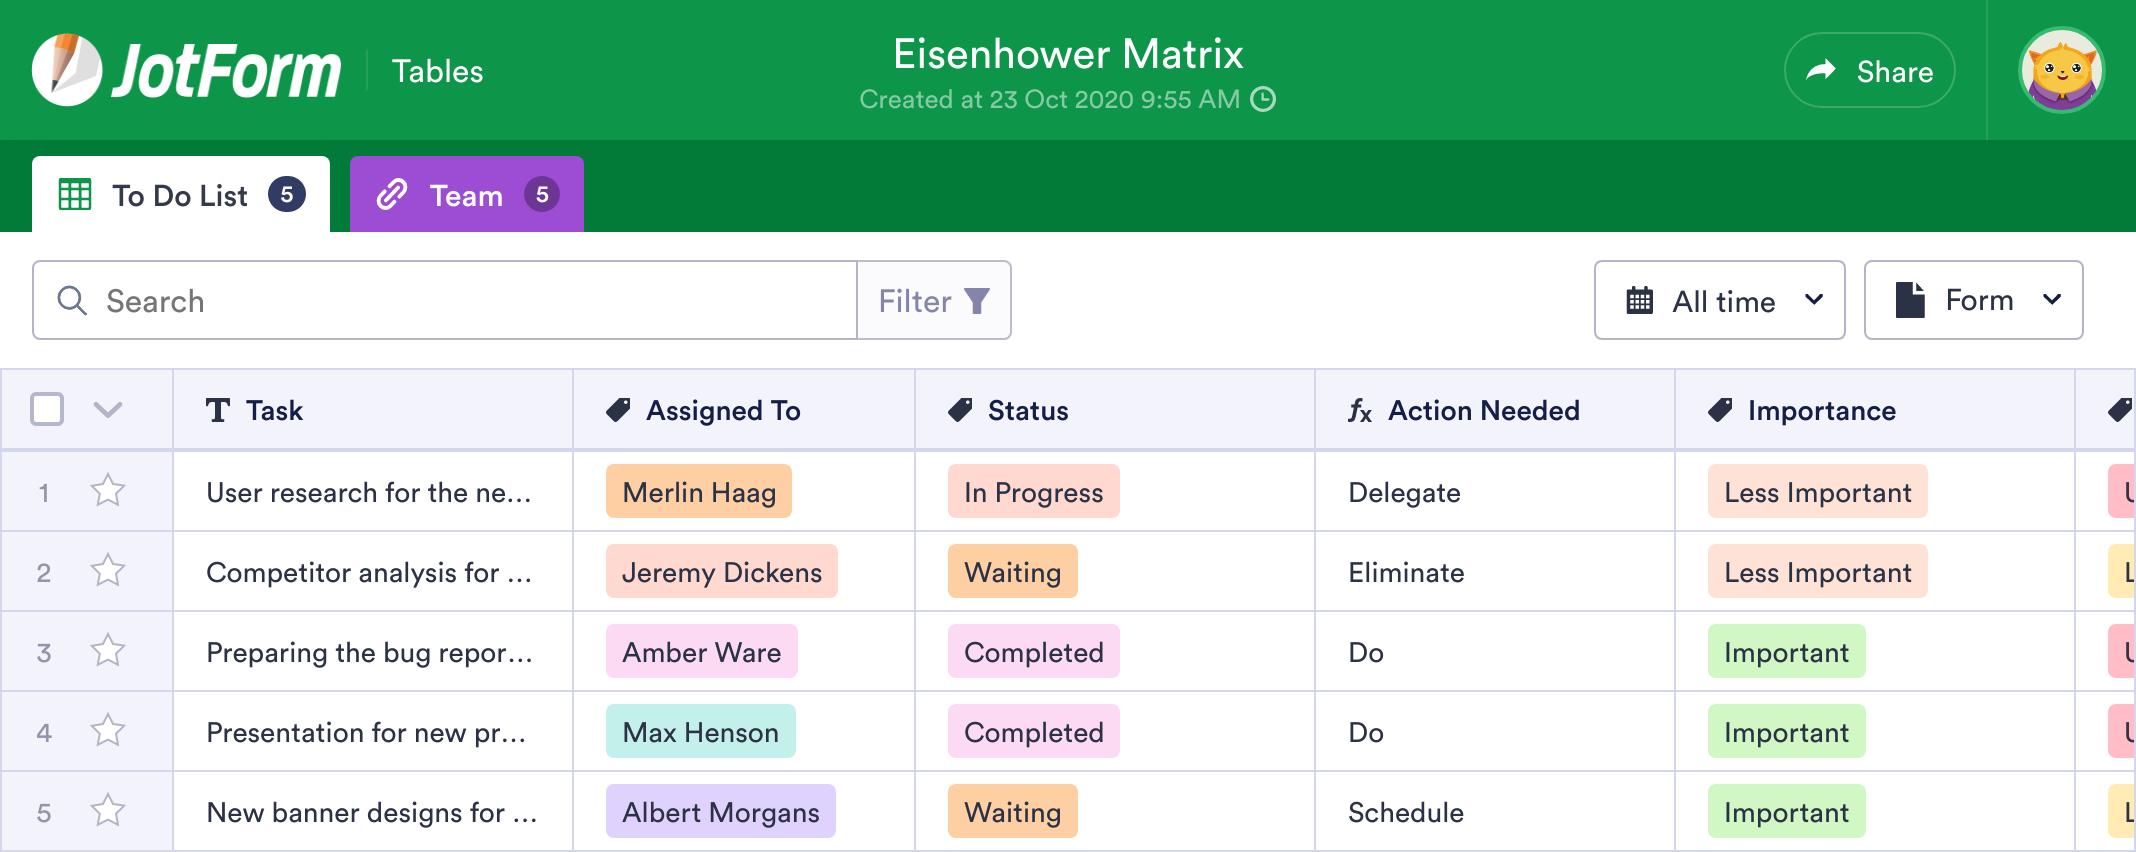 Eisenhower Matrix Template